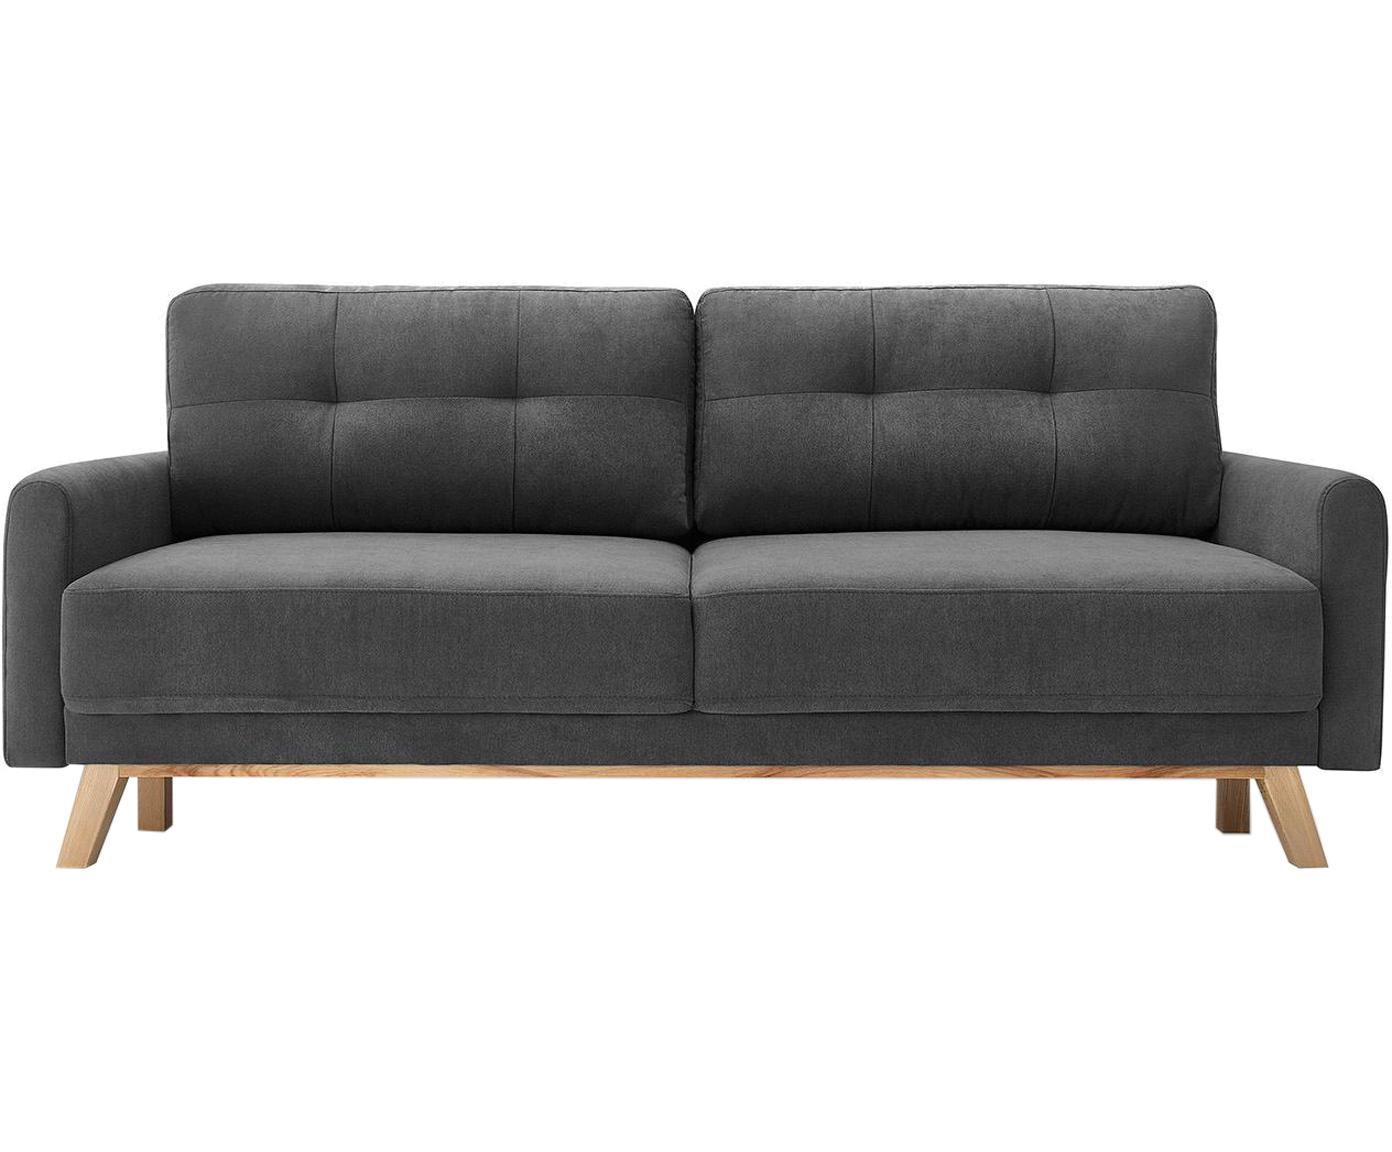 Sofá cama Balio (3plazas), Tapizado: tela, Gris , An 216 x F 102 cm